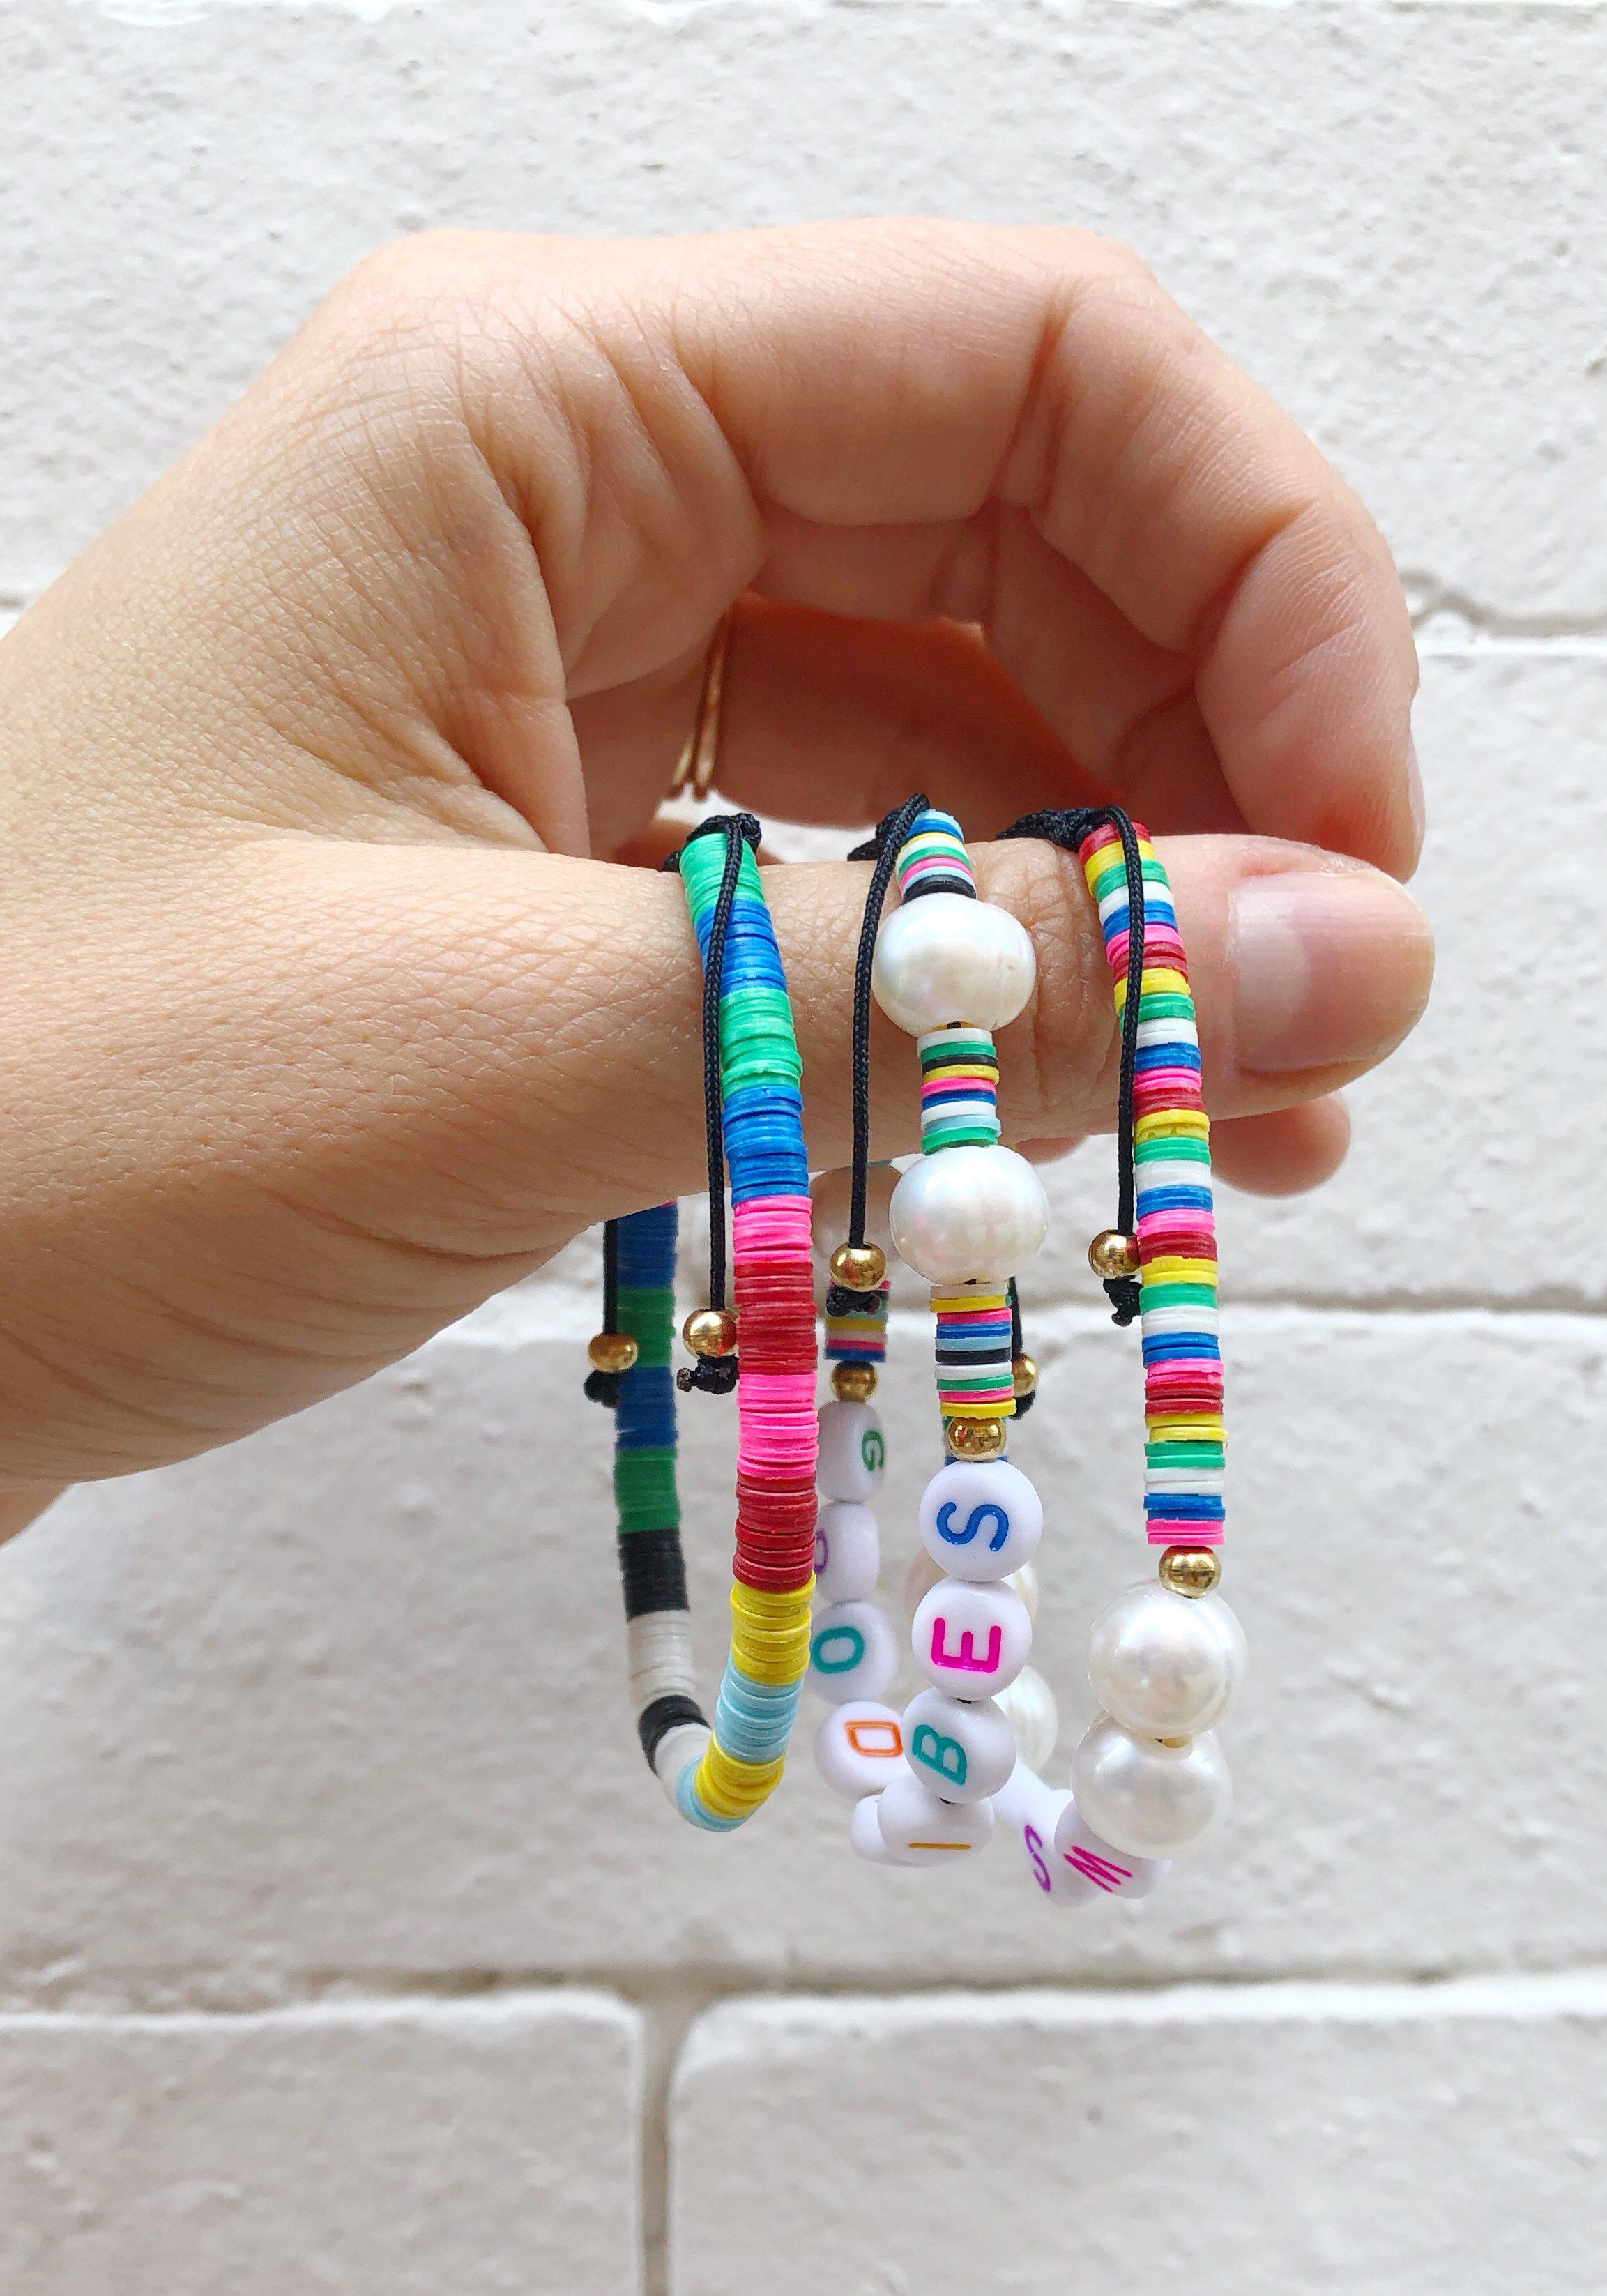 DIY Beaded Word Bracelets The Neon Tea Party WomanShopsWorld